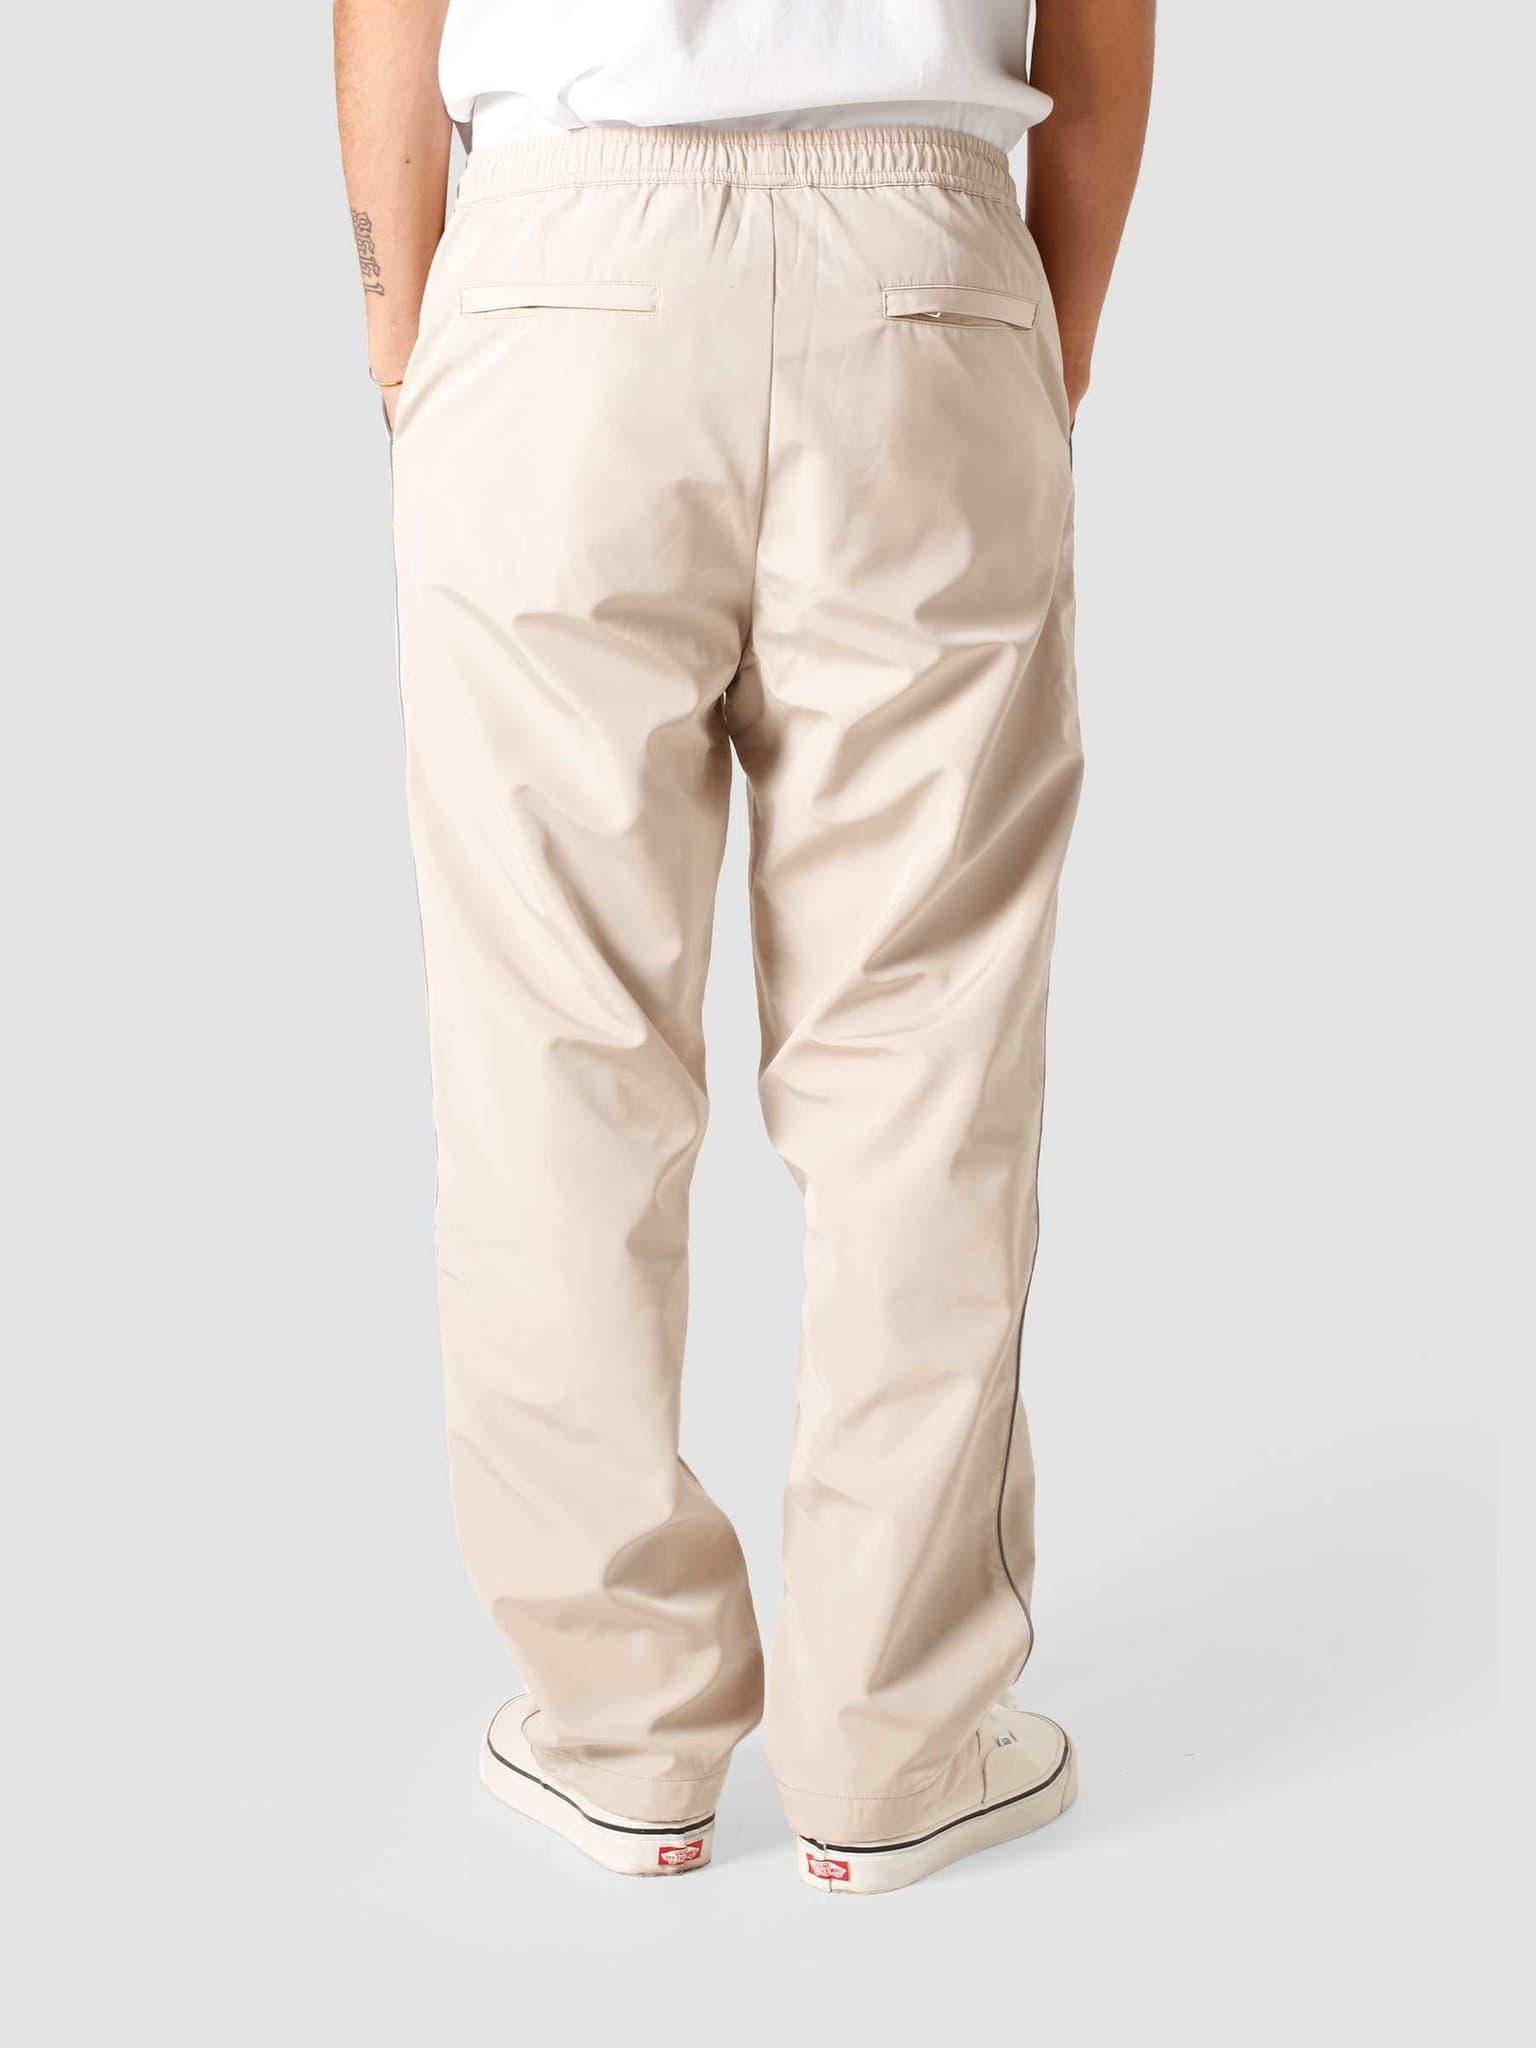 Etrack Pants Chateau Grey 2111023